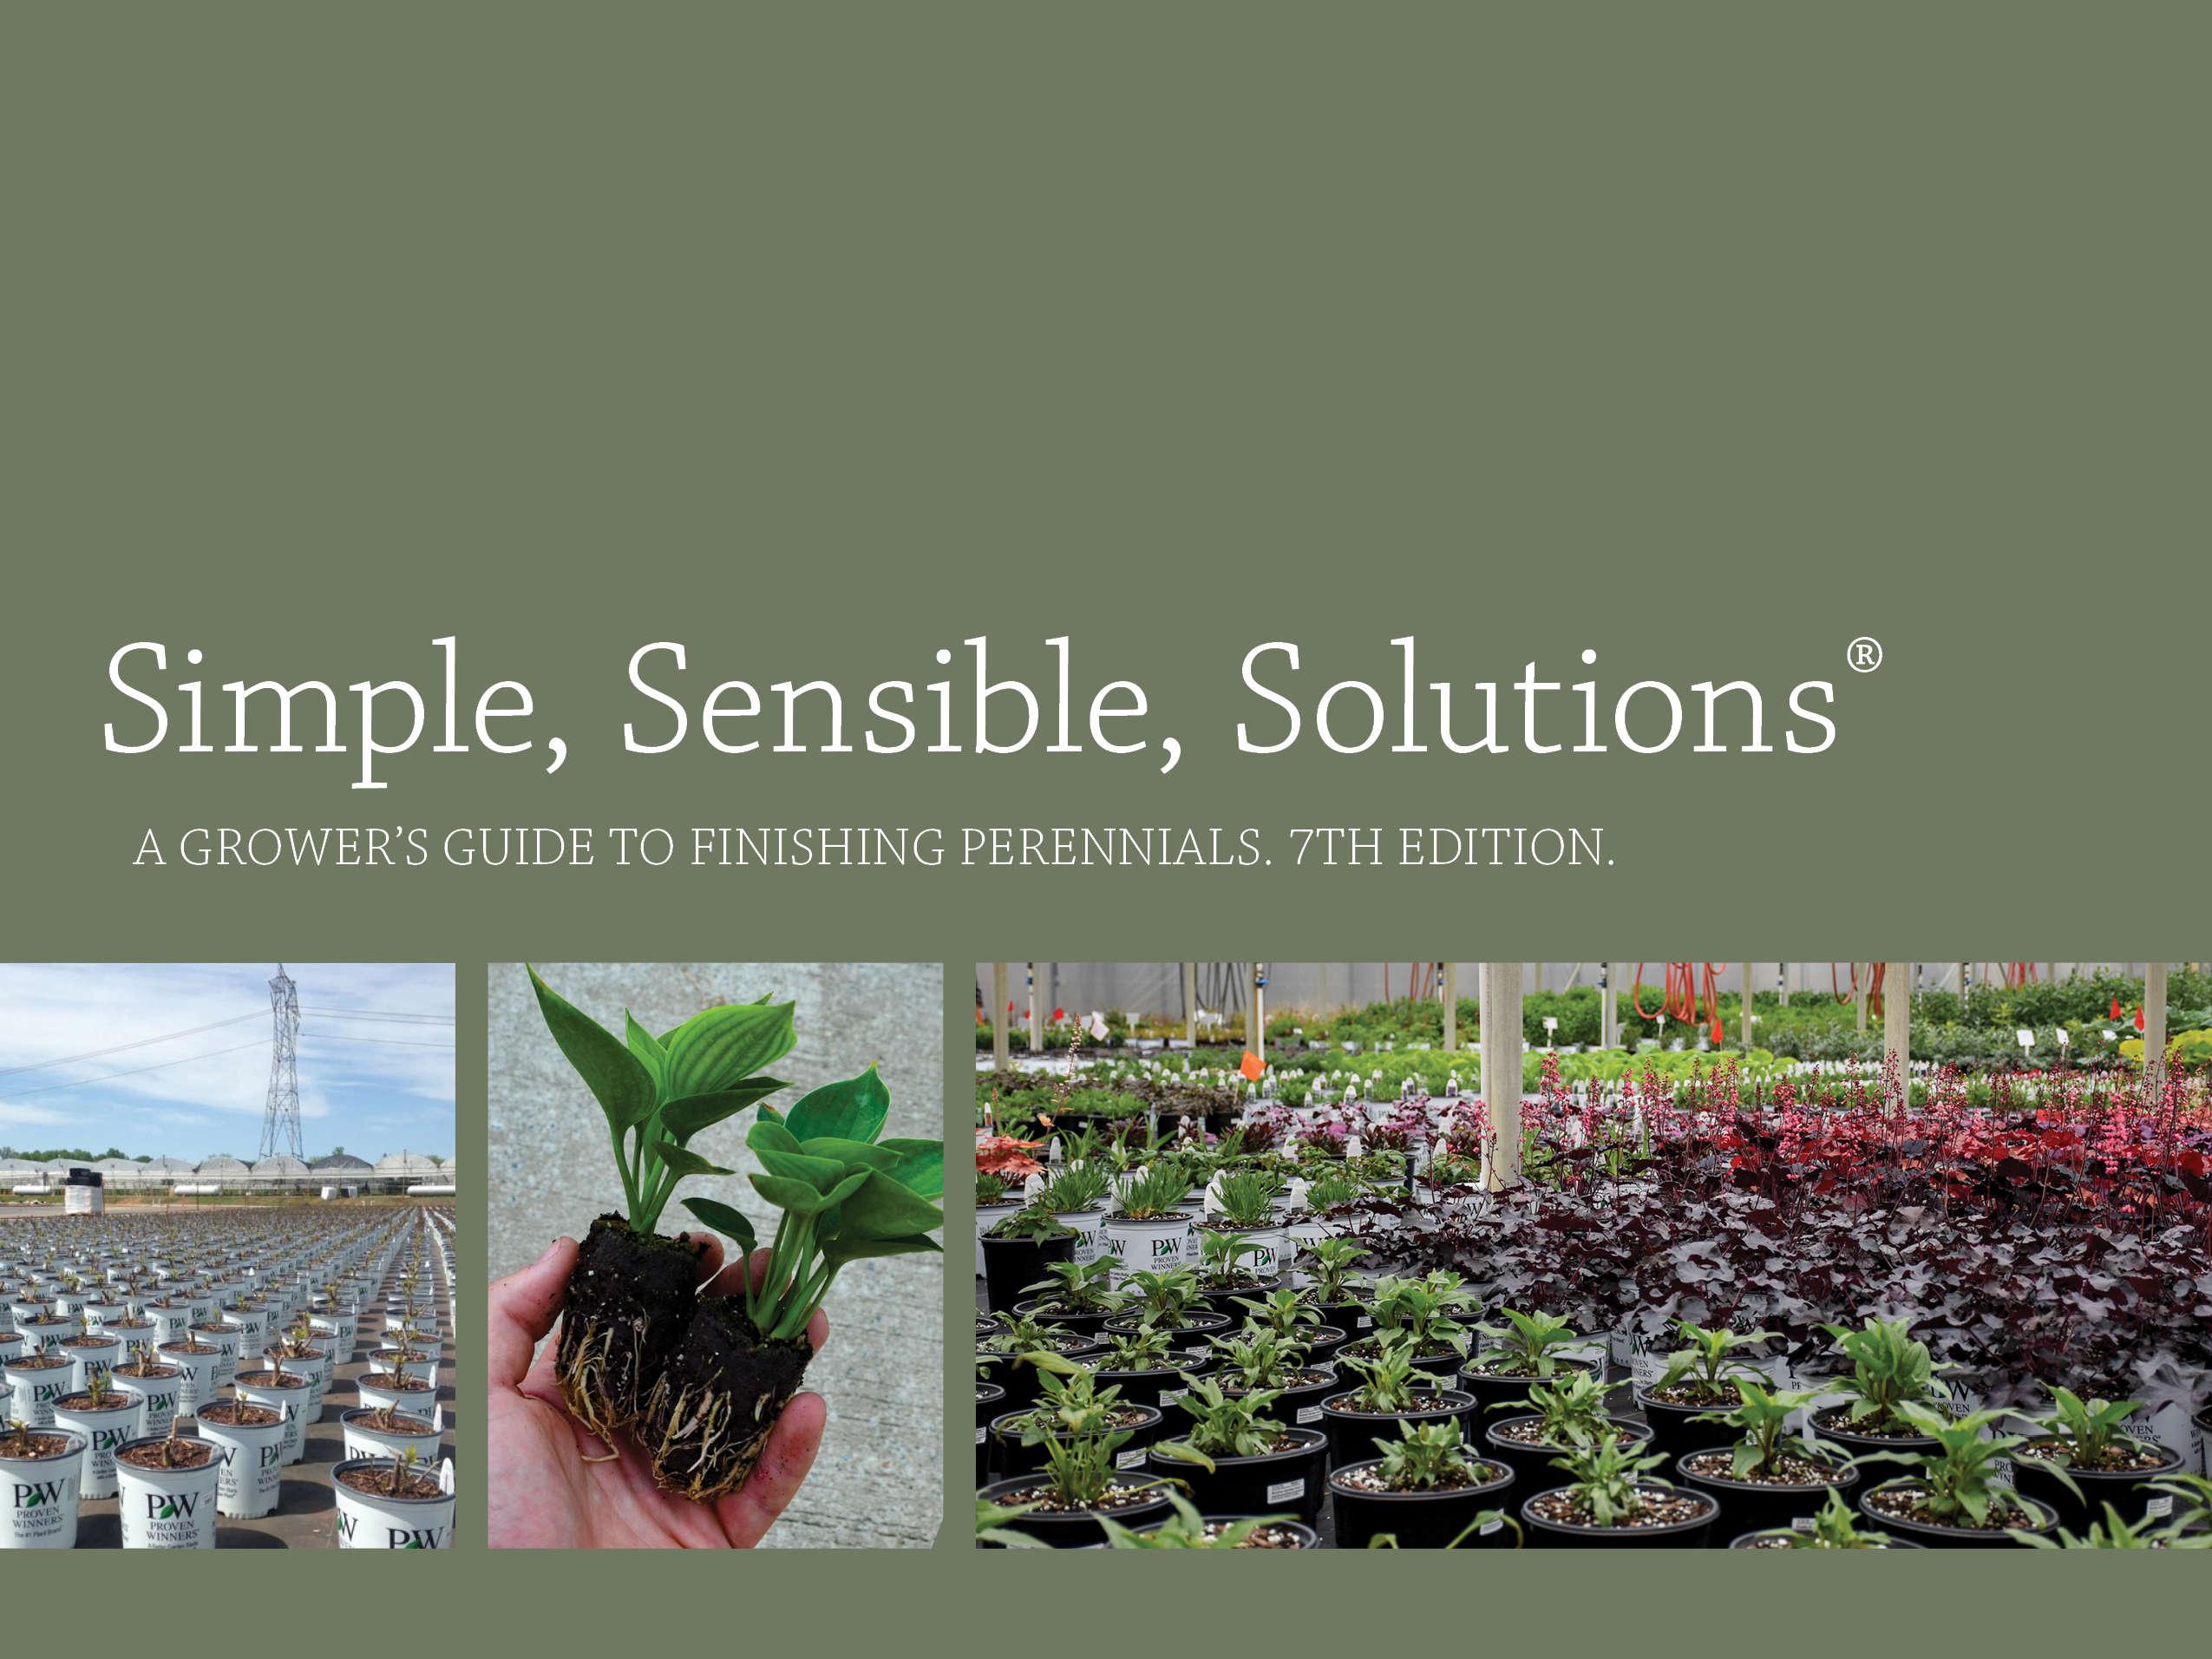 Simple, Sensible, Solutions®